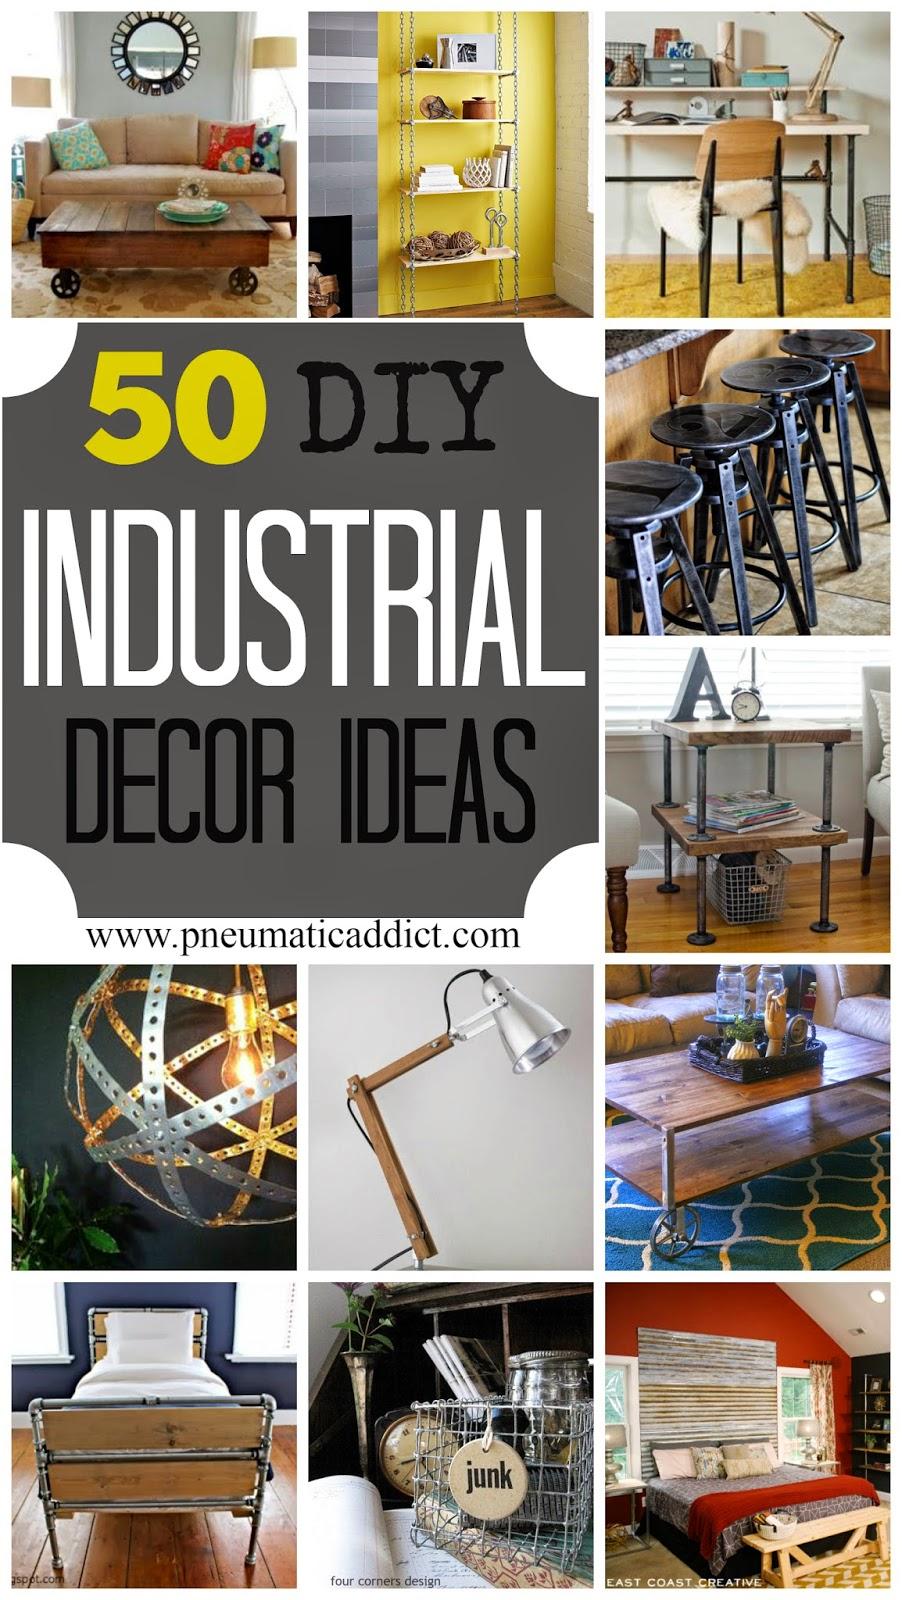 DIY Industrial Decor Ideas